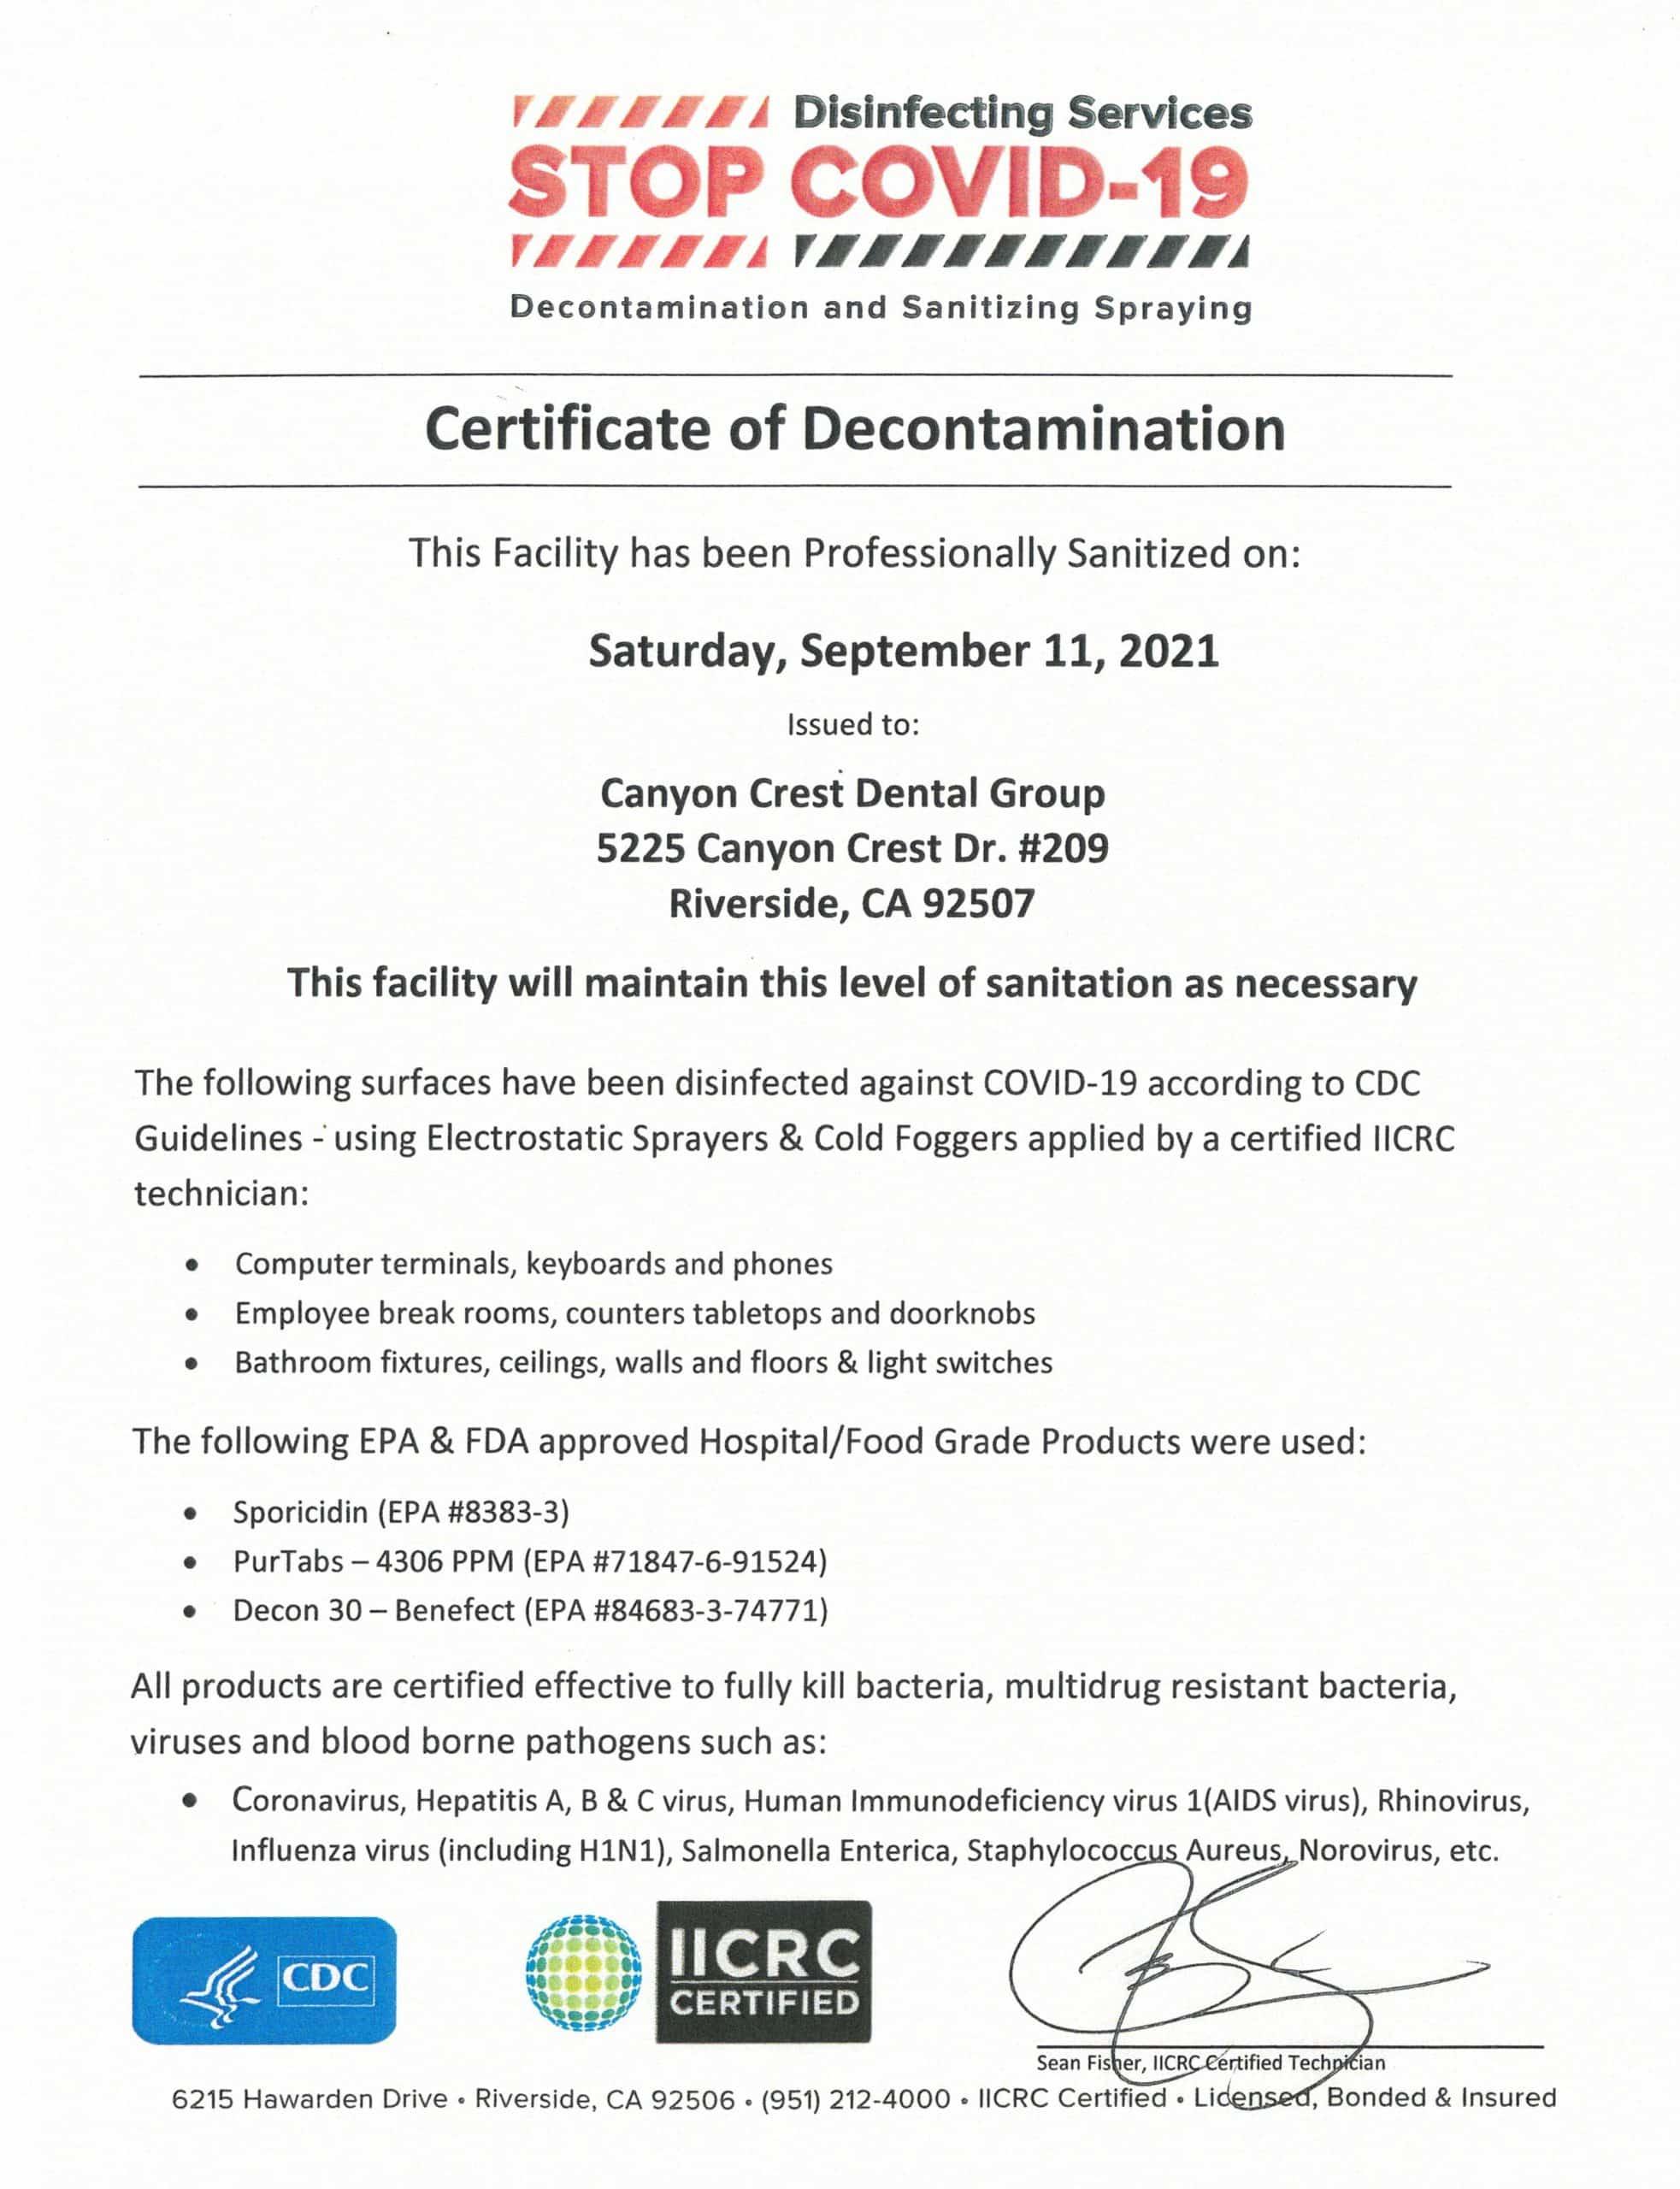 Covid 19 Certificate of Decontamination